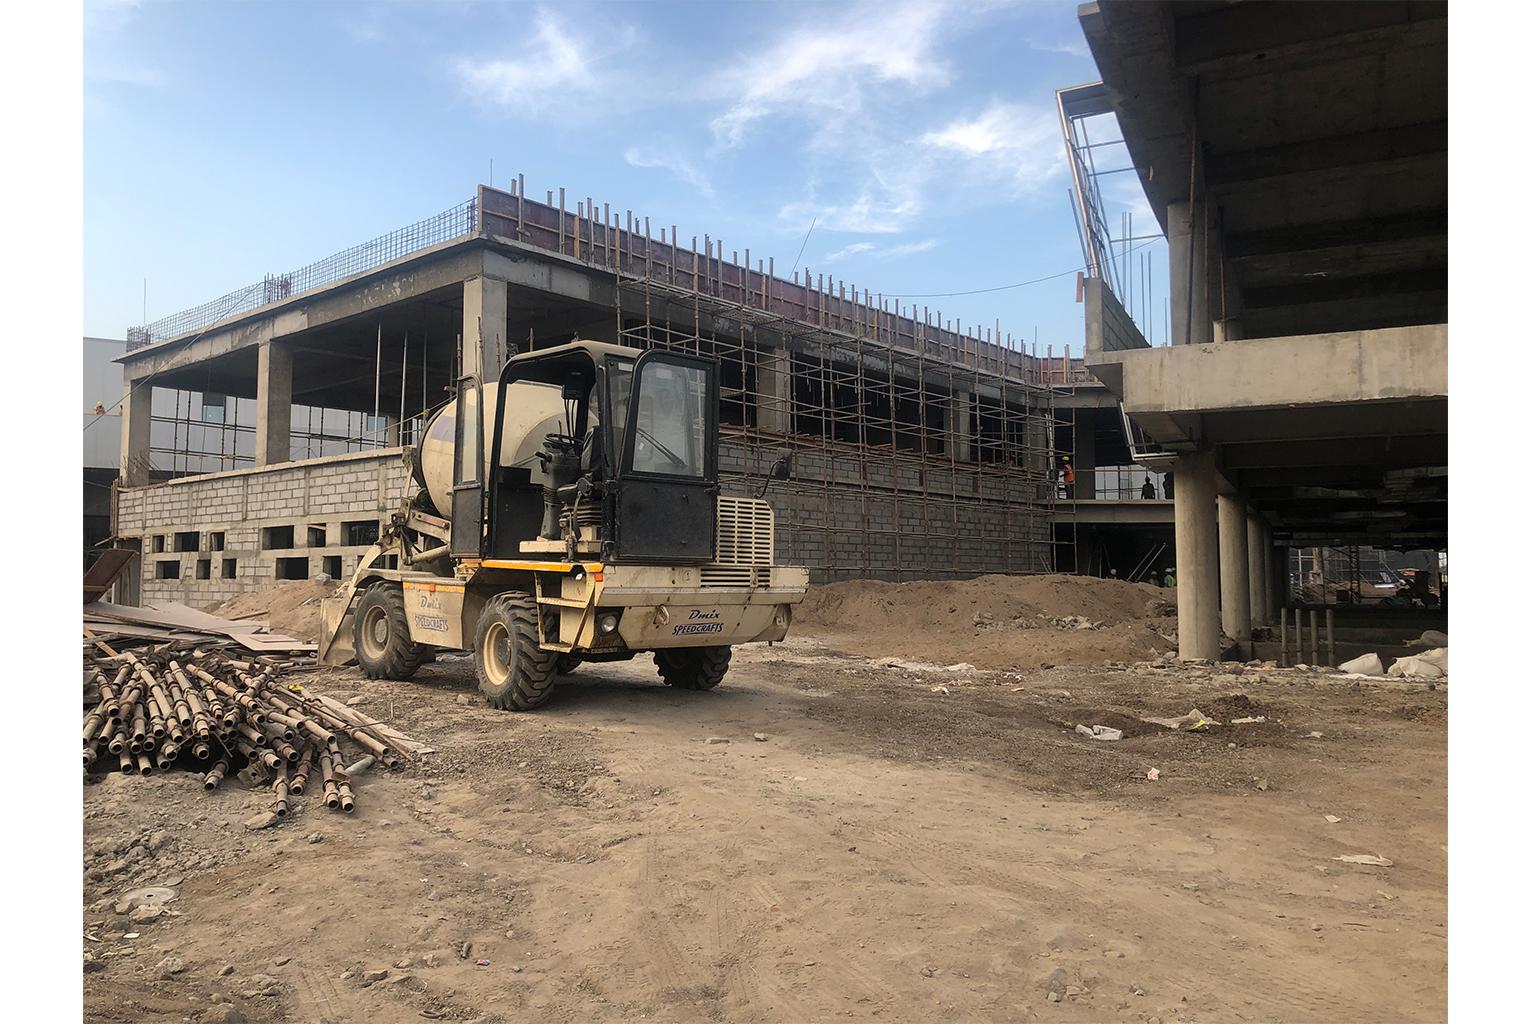 New Plasser India Industry Construction